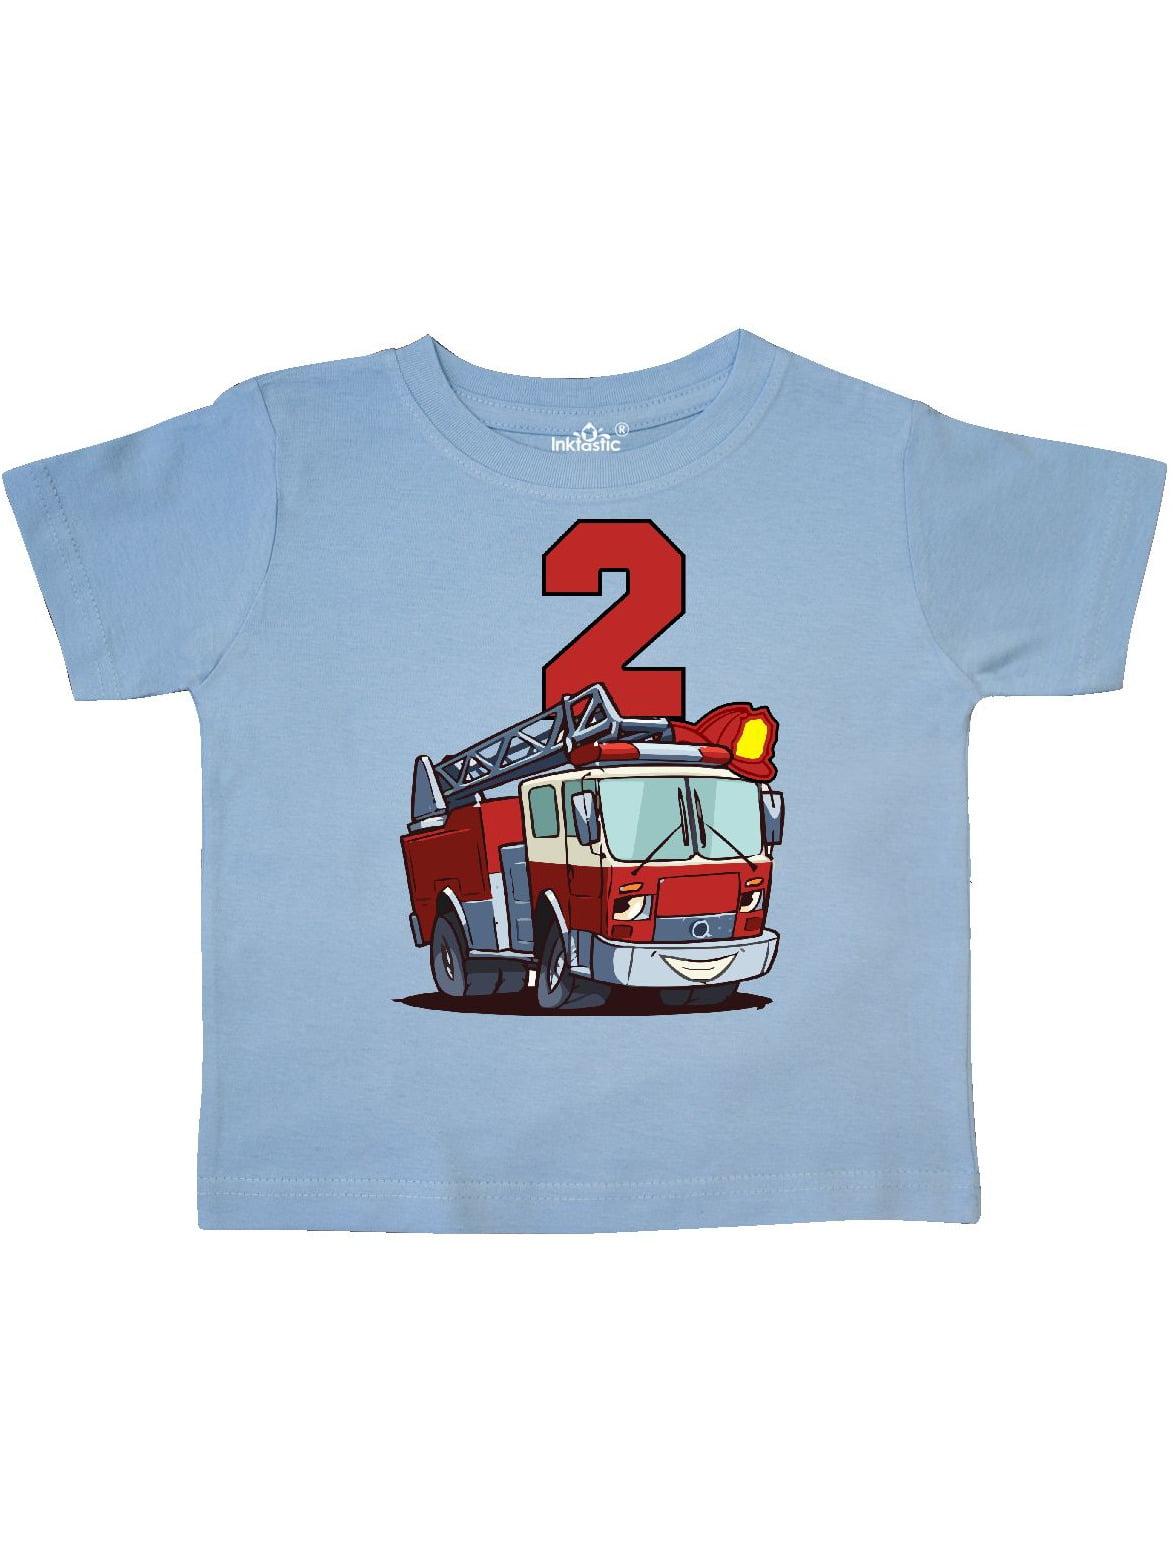 75c8bdcf6 Inktastic - 2nd Birthday Fire Truck Toddler T-Shirt - Walmart.com